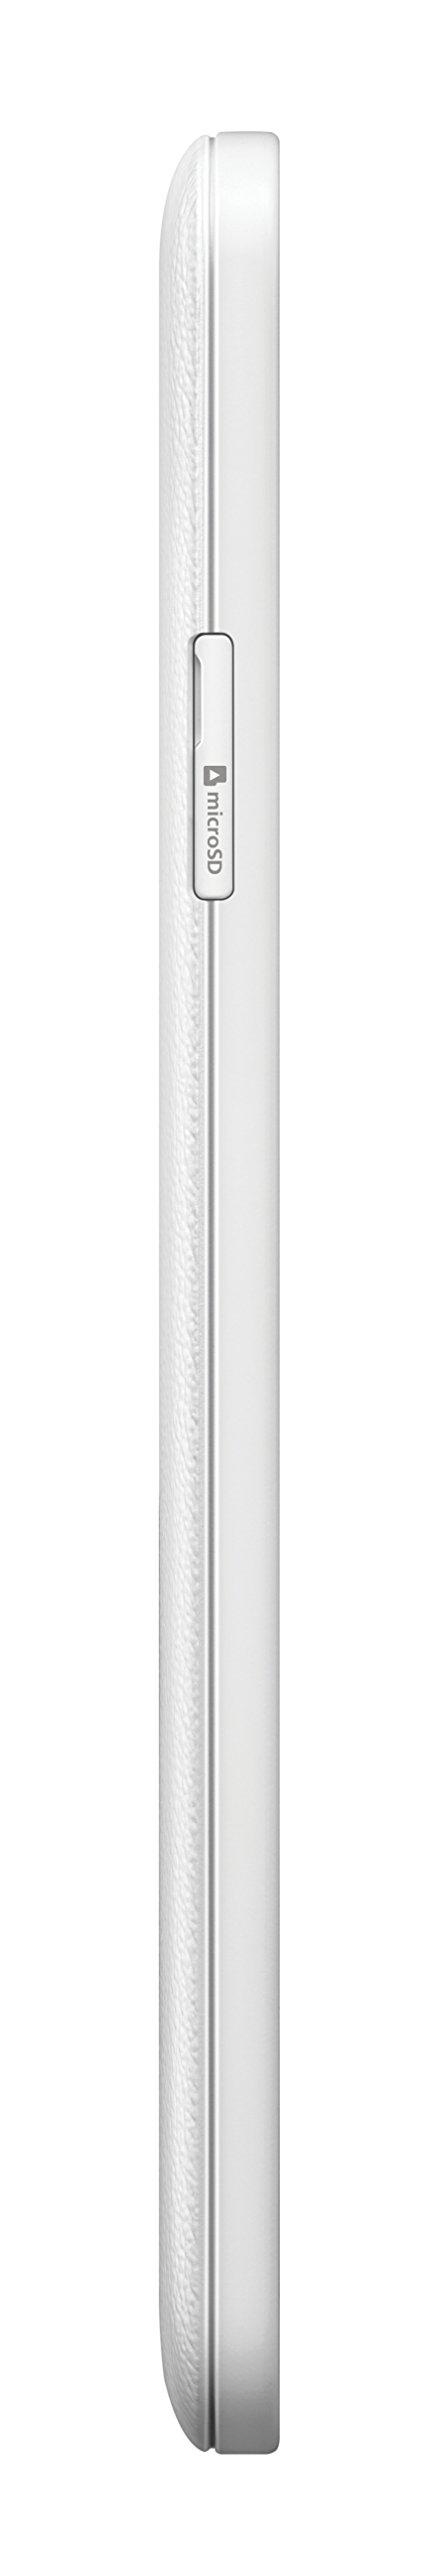 Samsung Galaxy Tab E Lite 7''; 8 GB Wifi Tablet (White) SM-T113NDWAXAR by Samsung (Image #4)